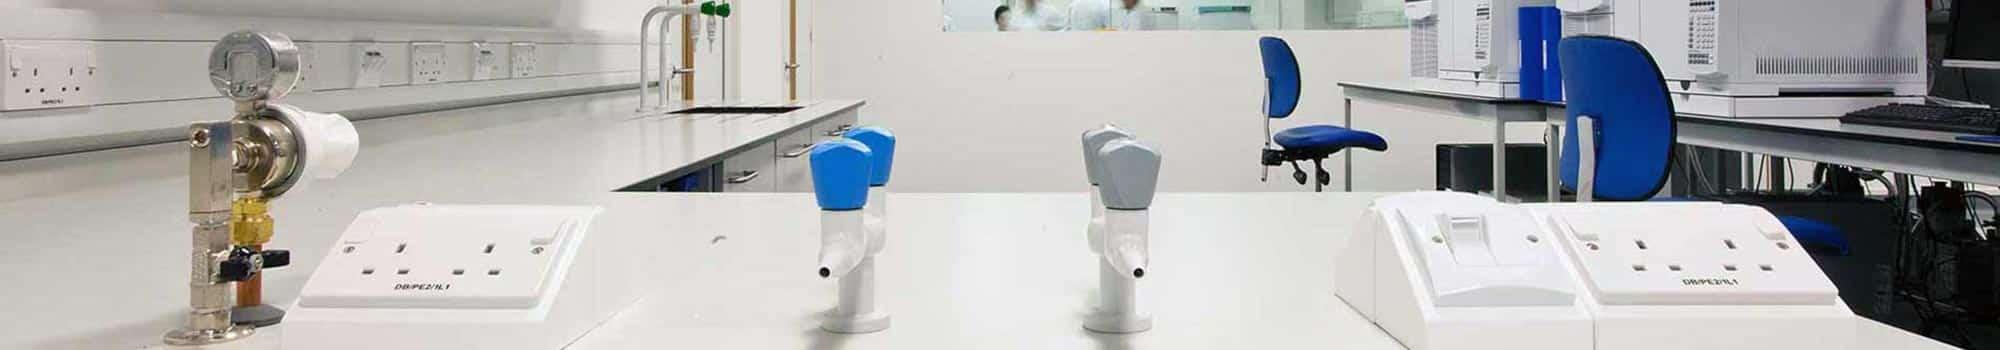 interfocus laboratory furniture manufacturer